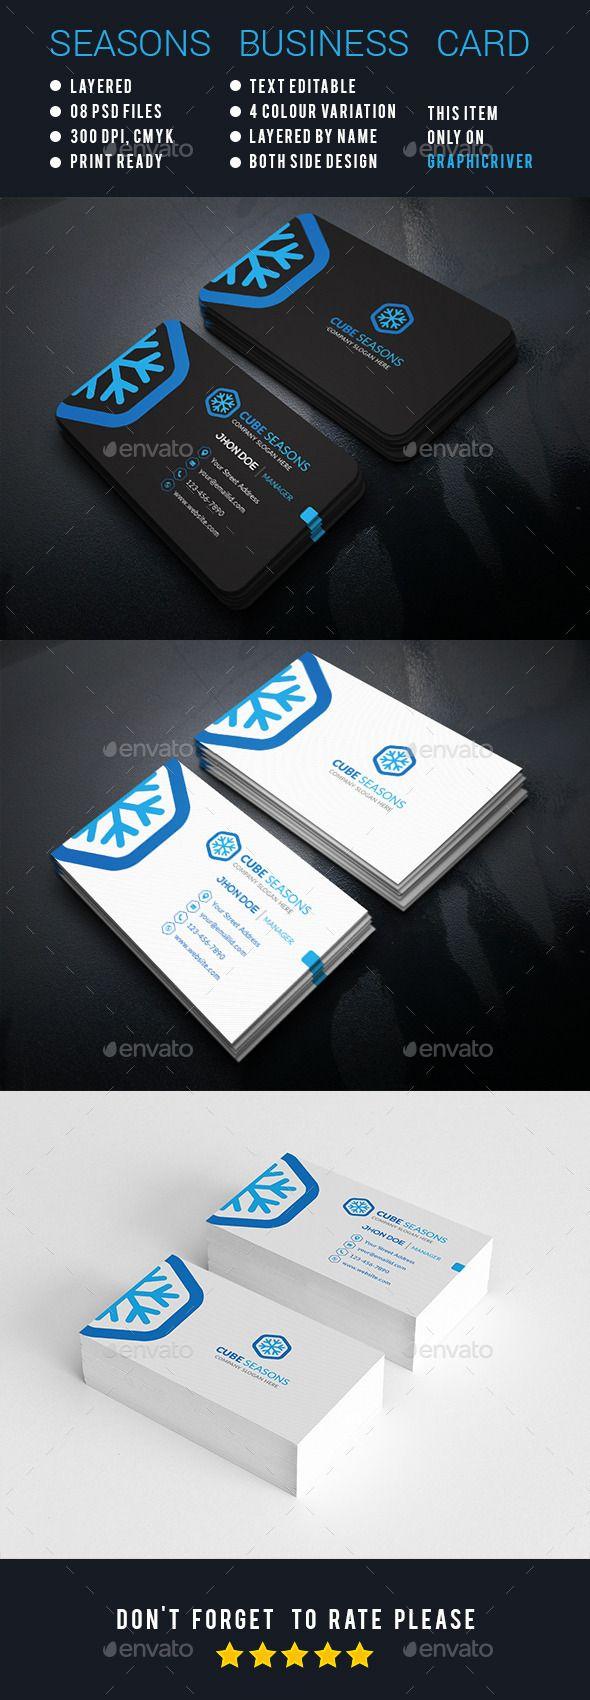 22 Best Business Card Ideas Images On Pinterest Card Ideas